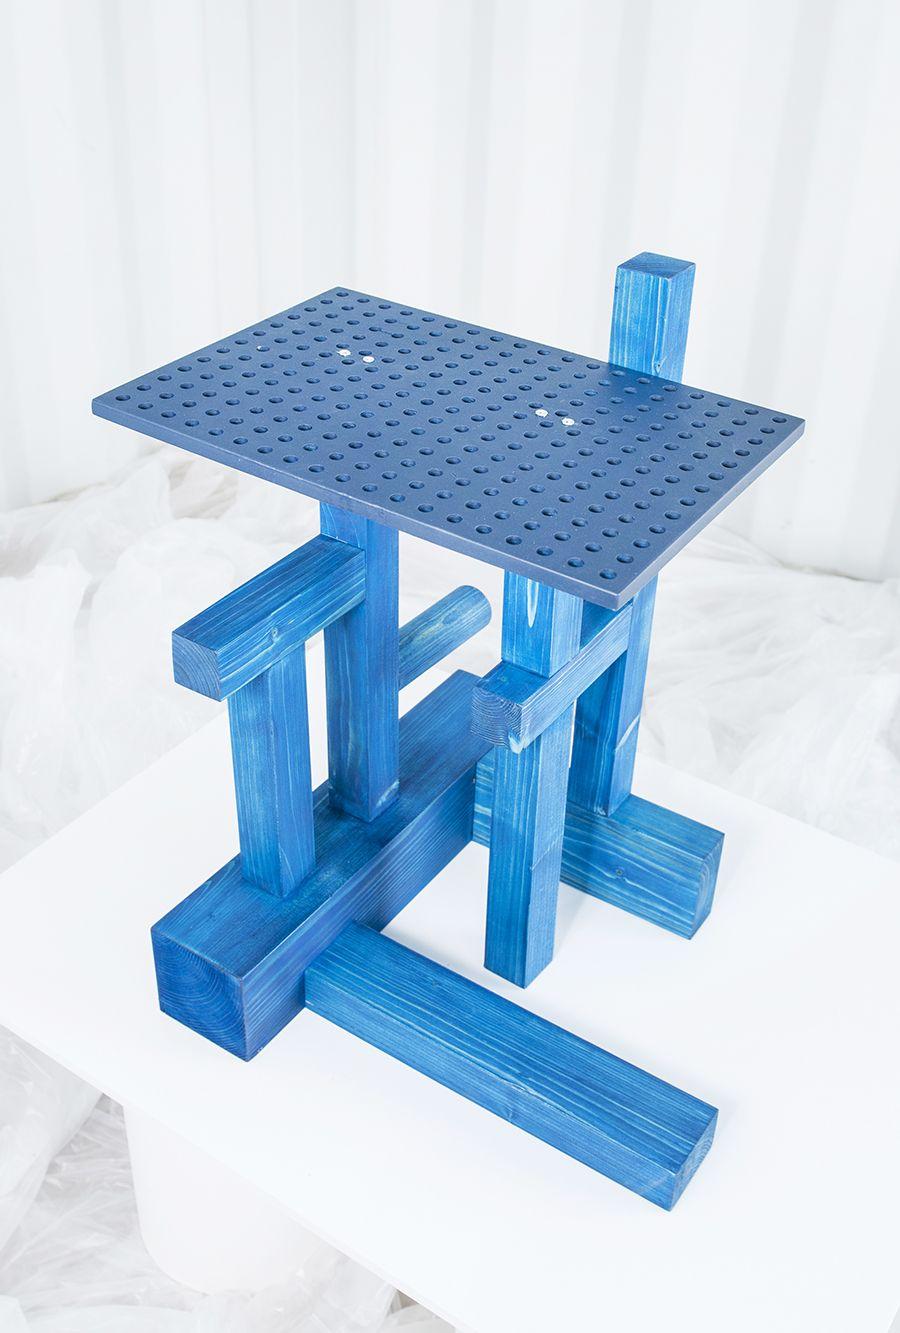 Malmo upcycling service dream furniture furniture making table furniture modern furniture furniture